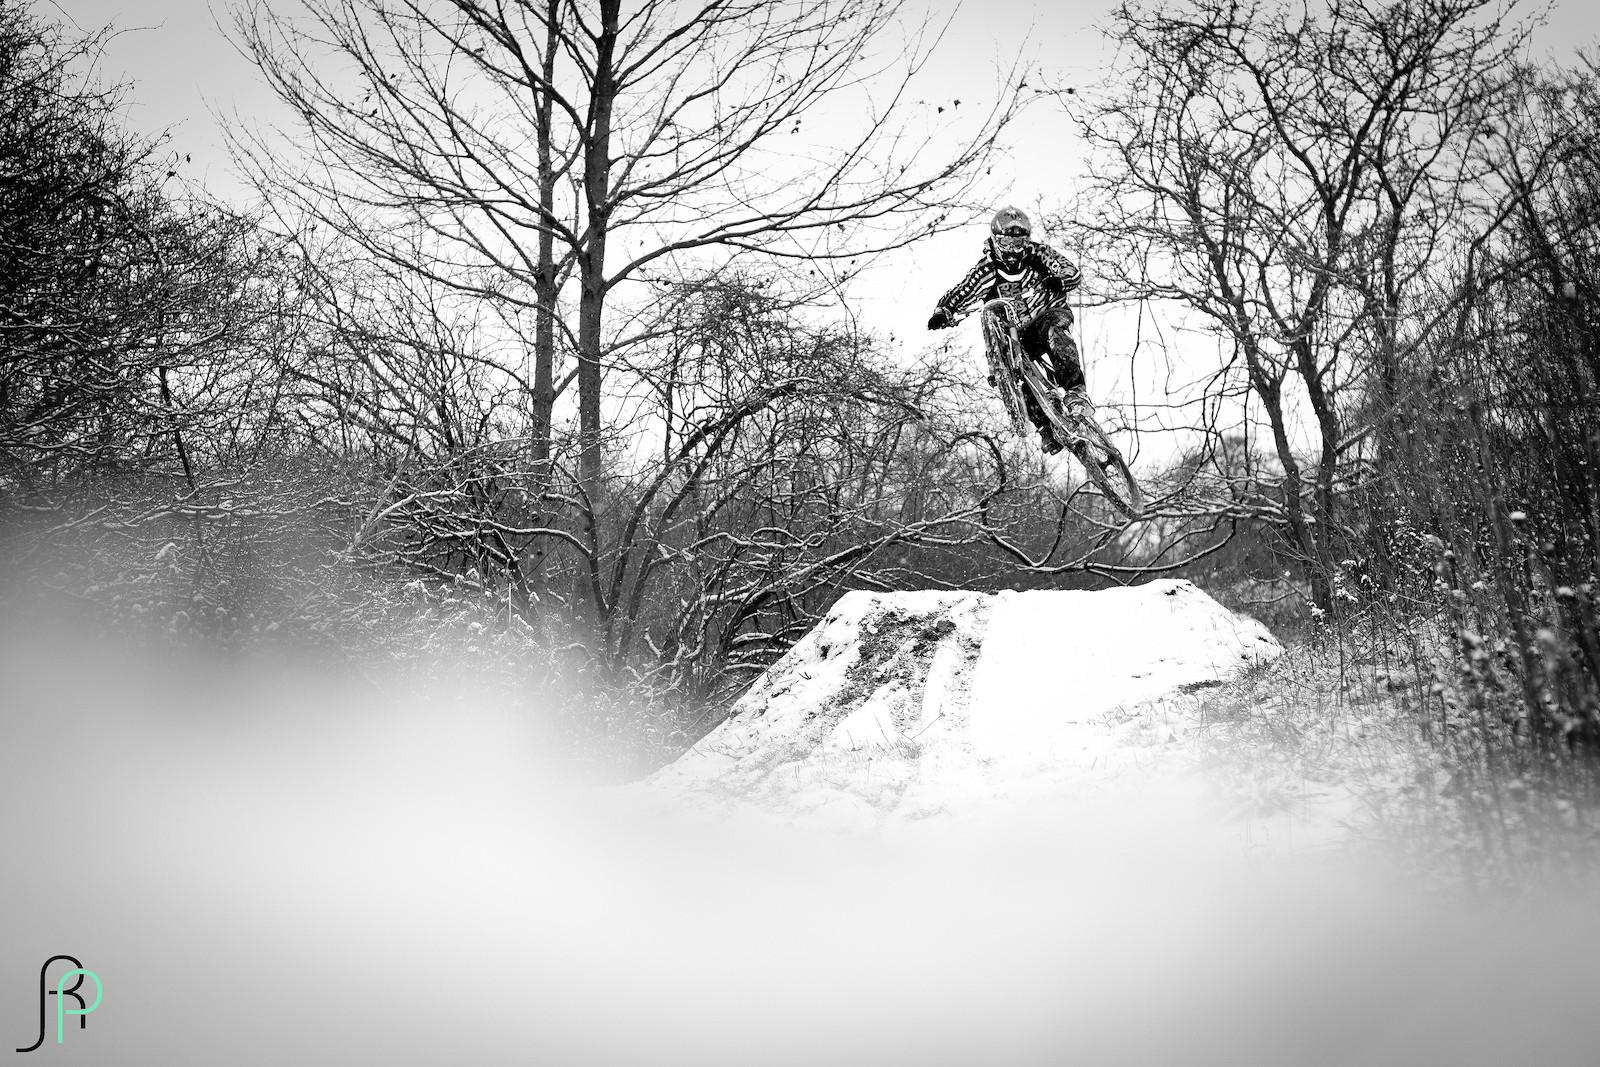 Adam Robbins - Step Up  - JackPadega - Mountain Biking Pictures - Vital MTB